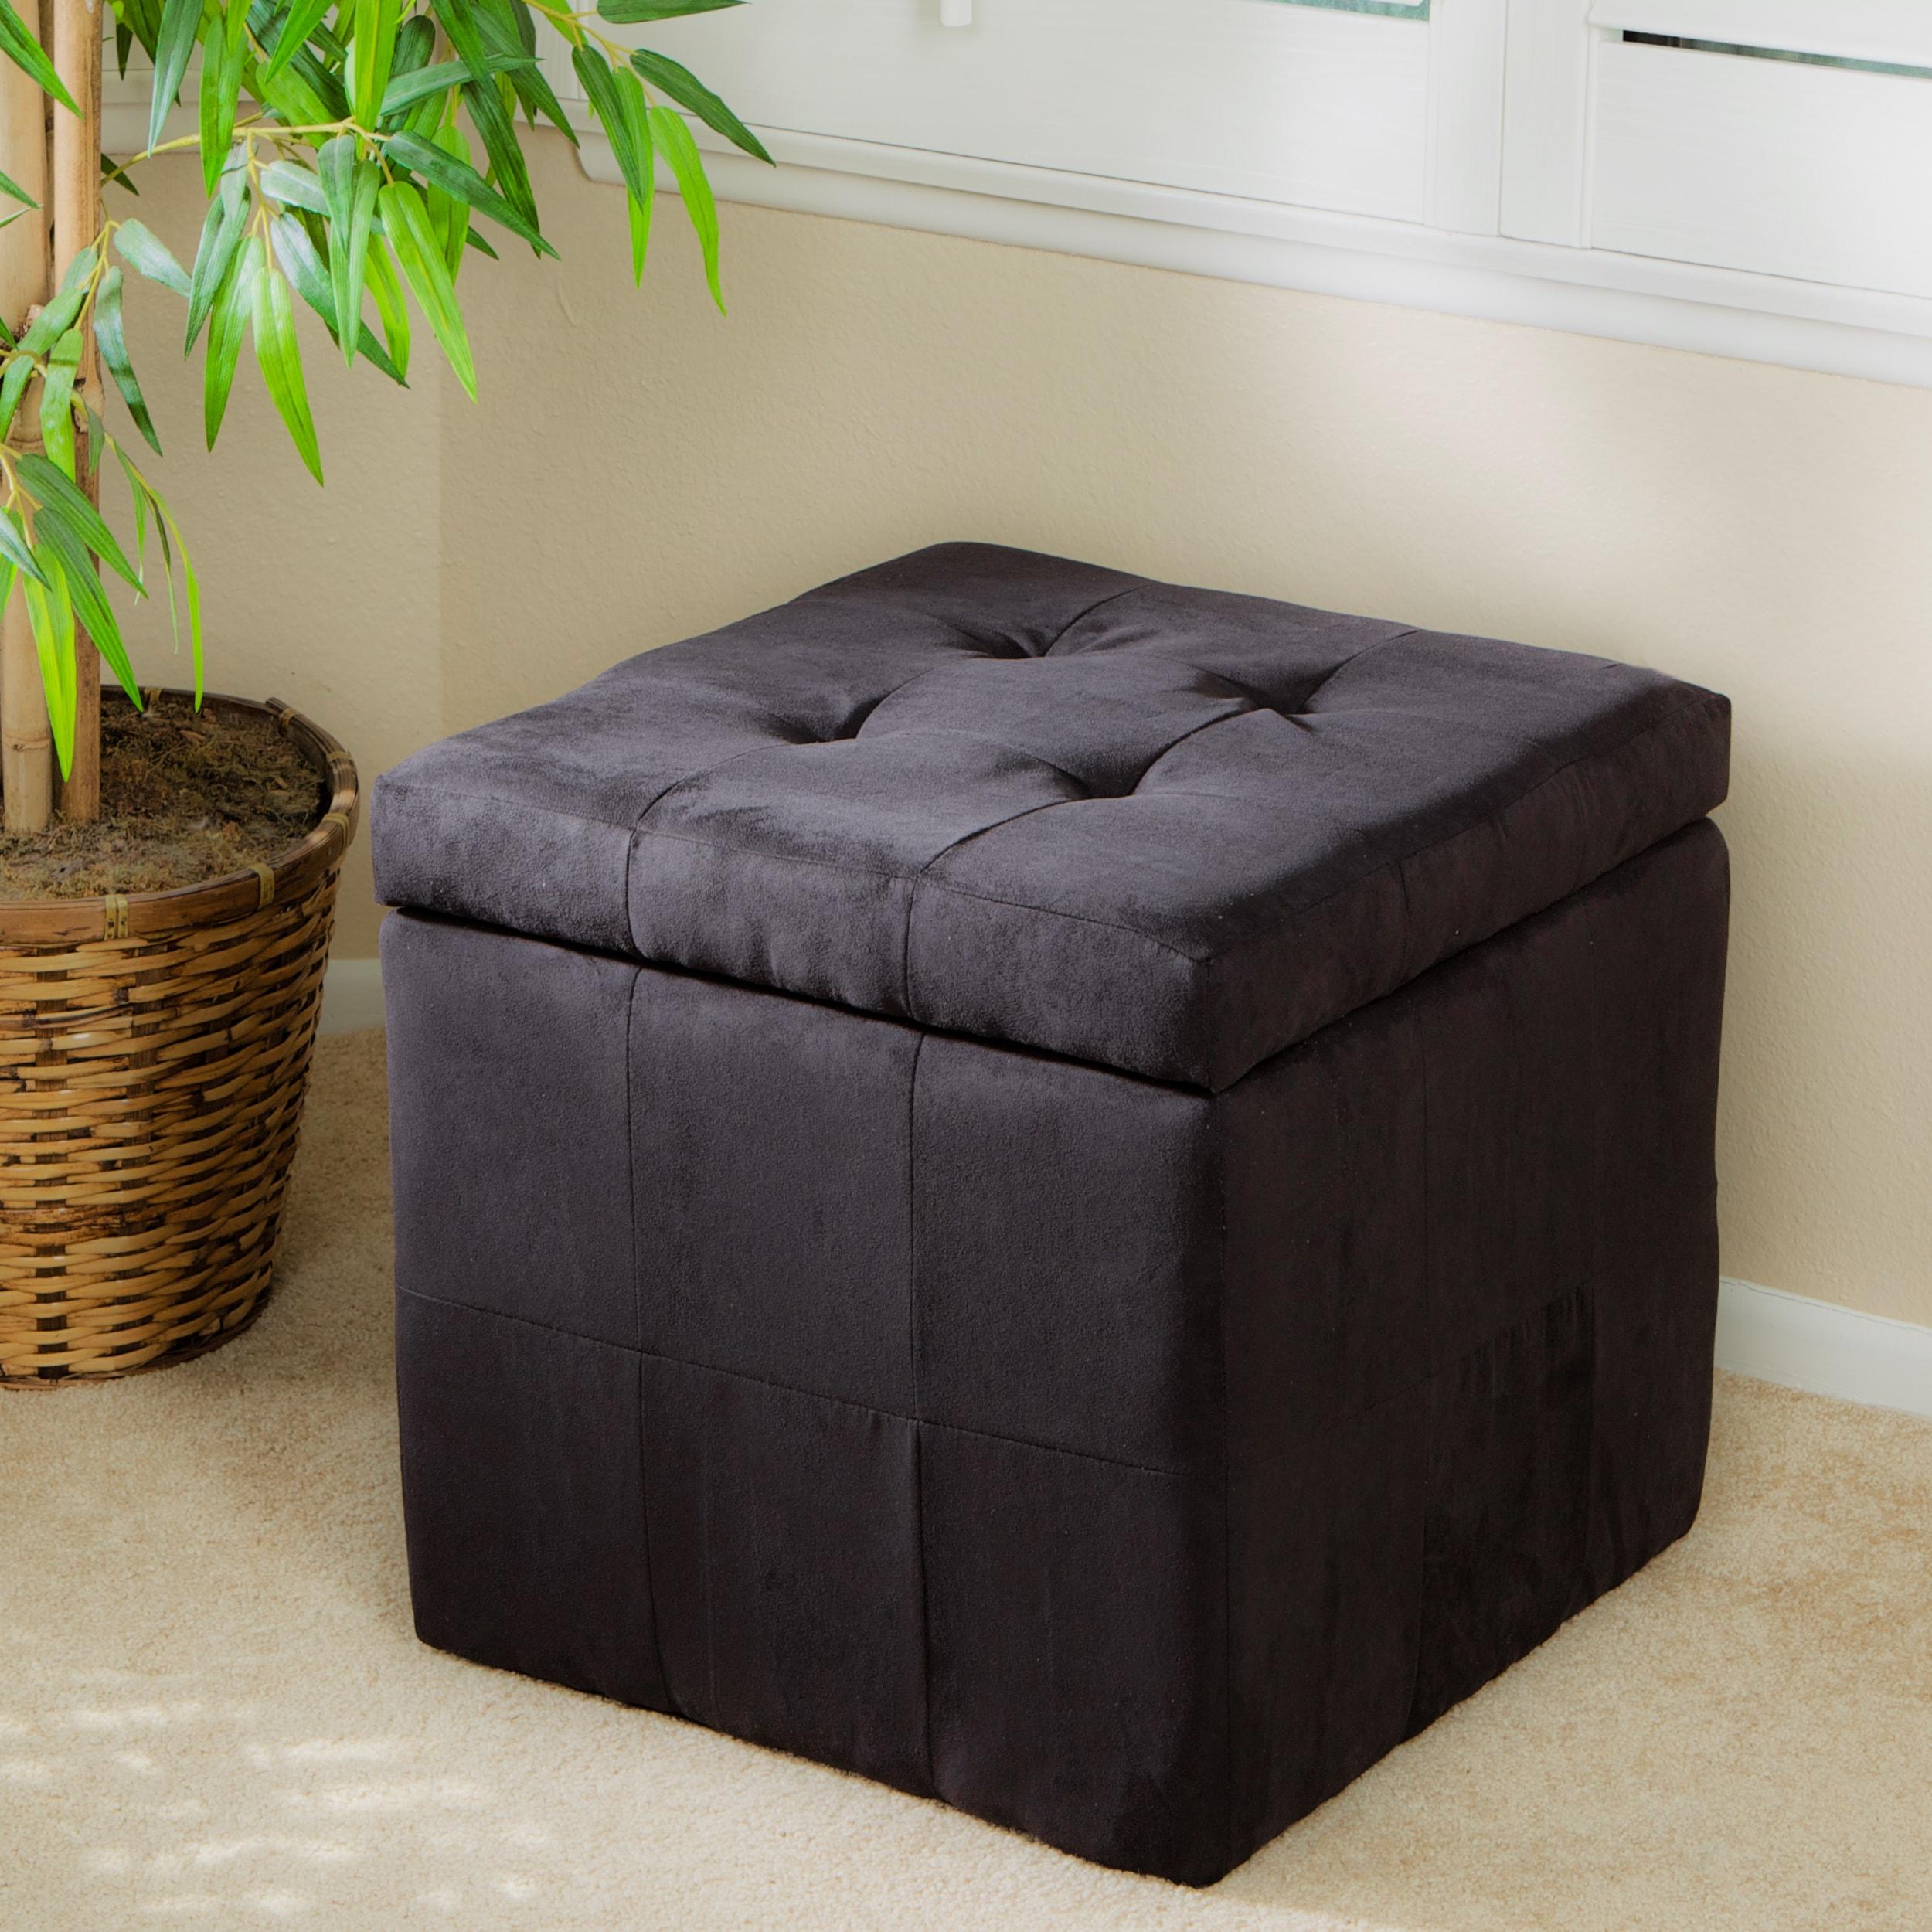 Tufted Black Fabric Storage Cube Ottoman 13915122